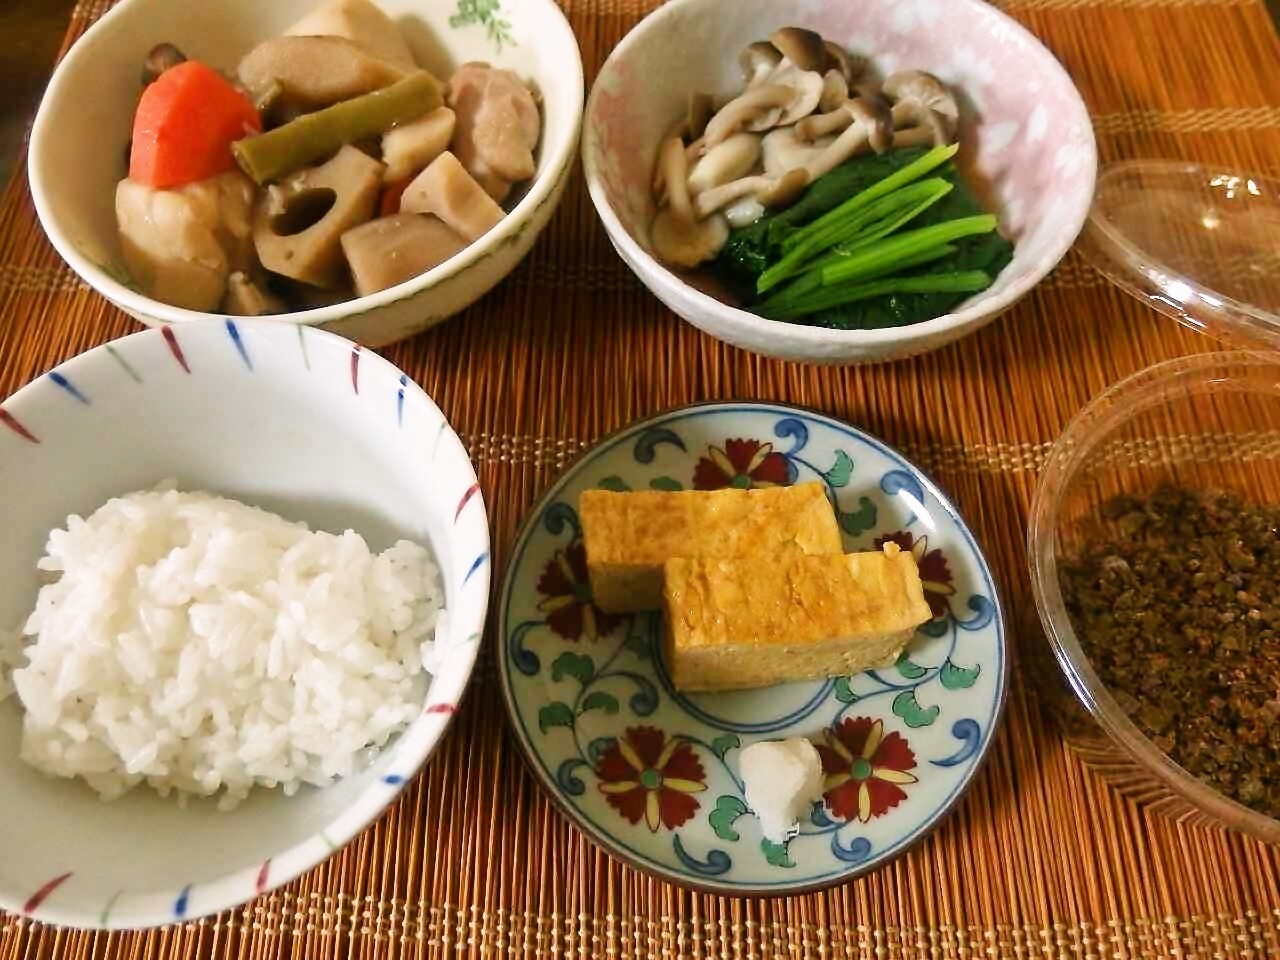 foodpic6021843.jpg